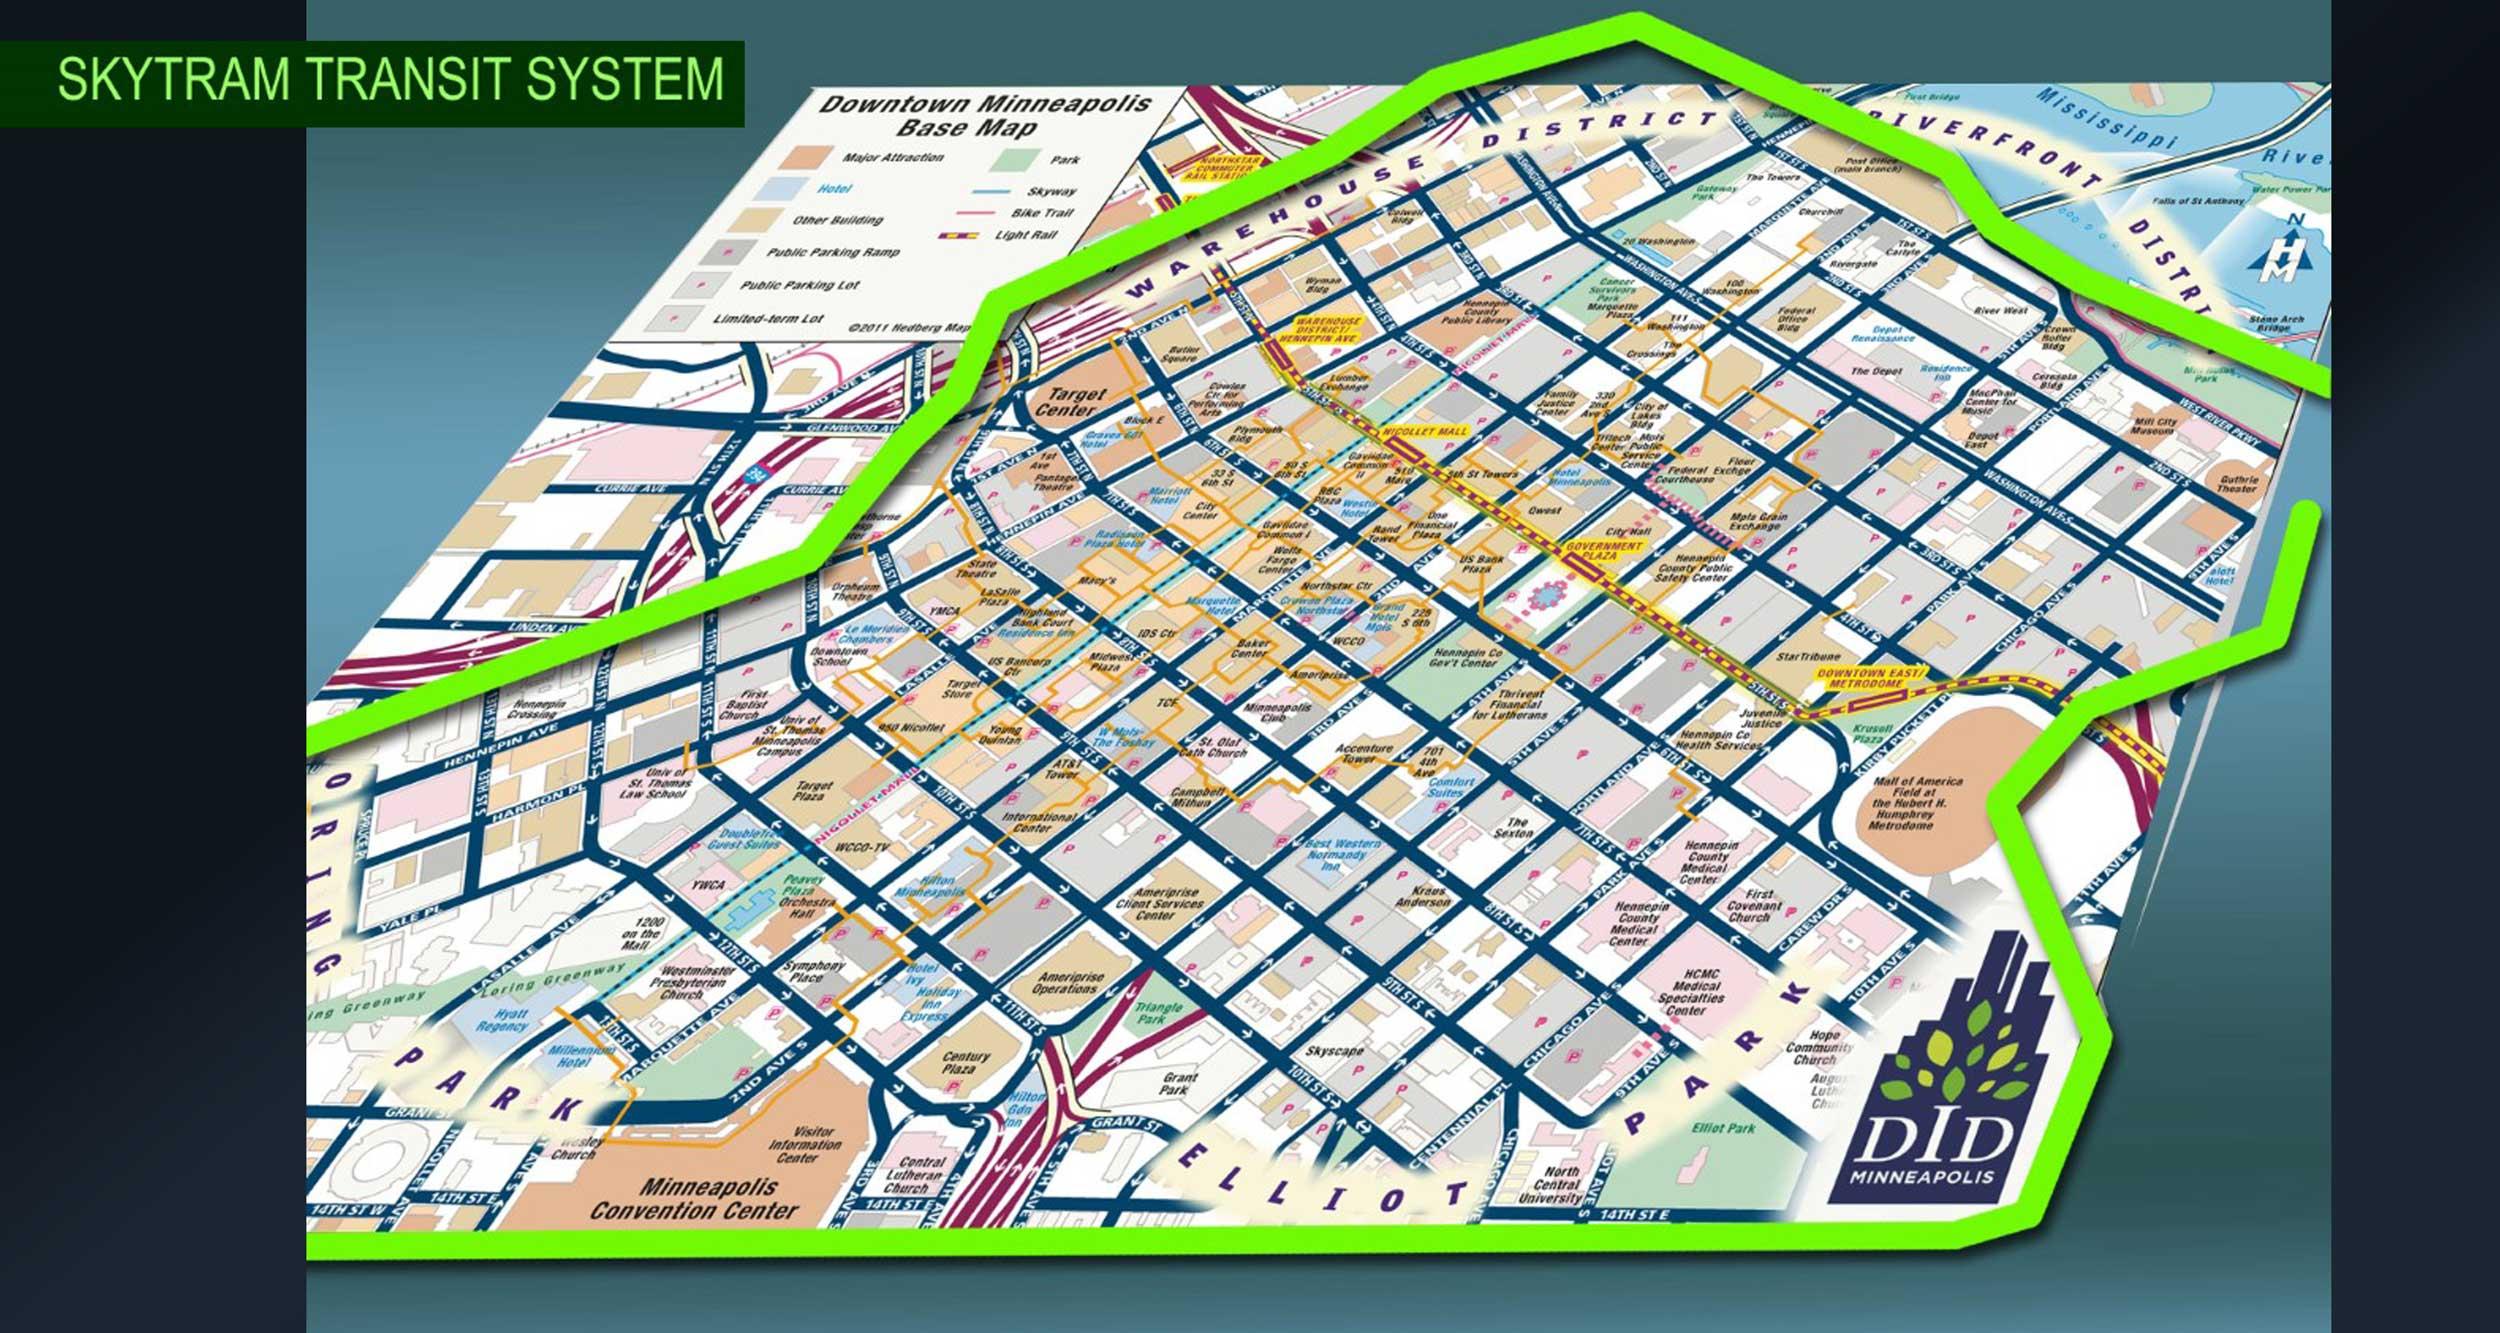 skytram-transit-map-rev-020517.jpg